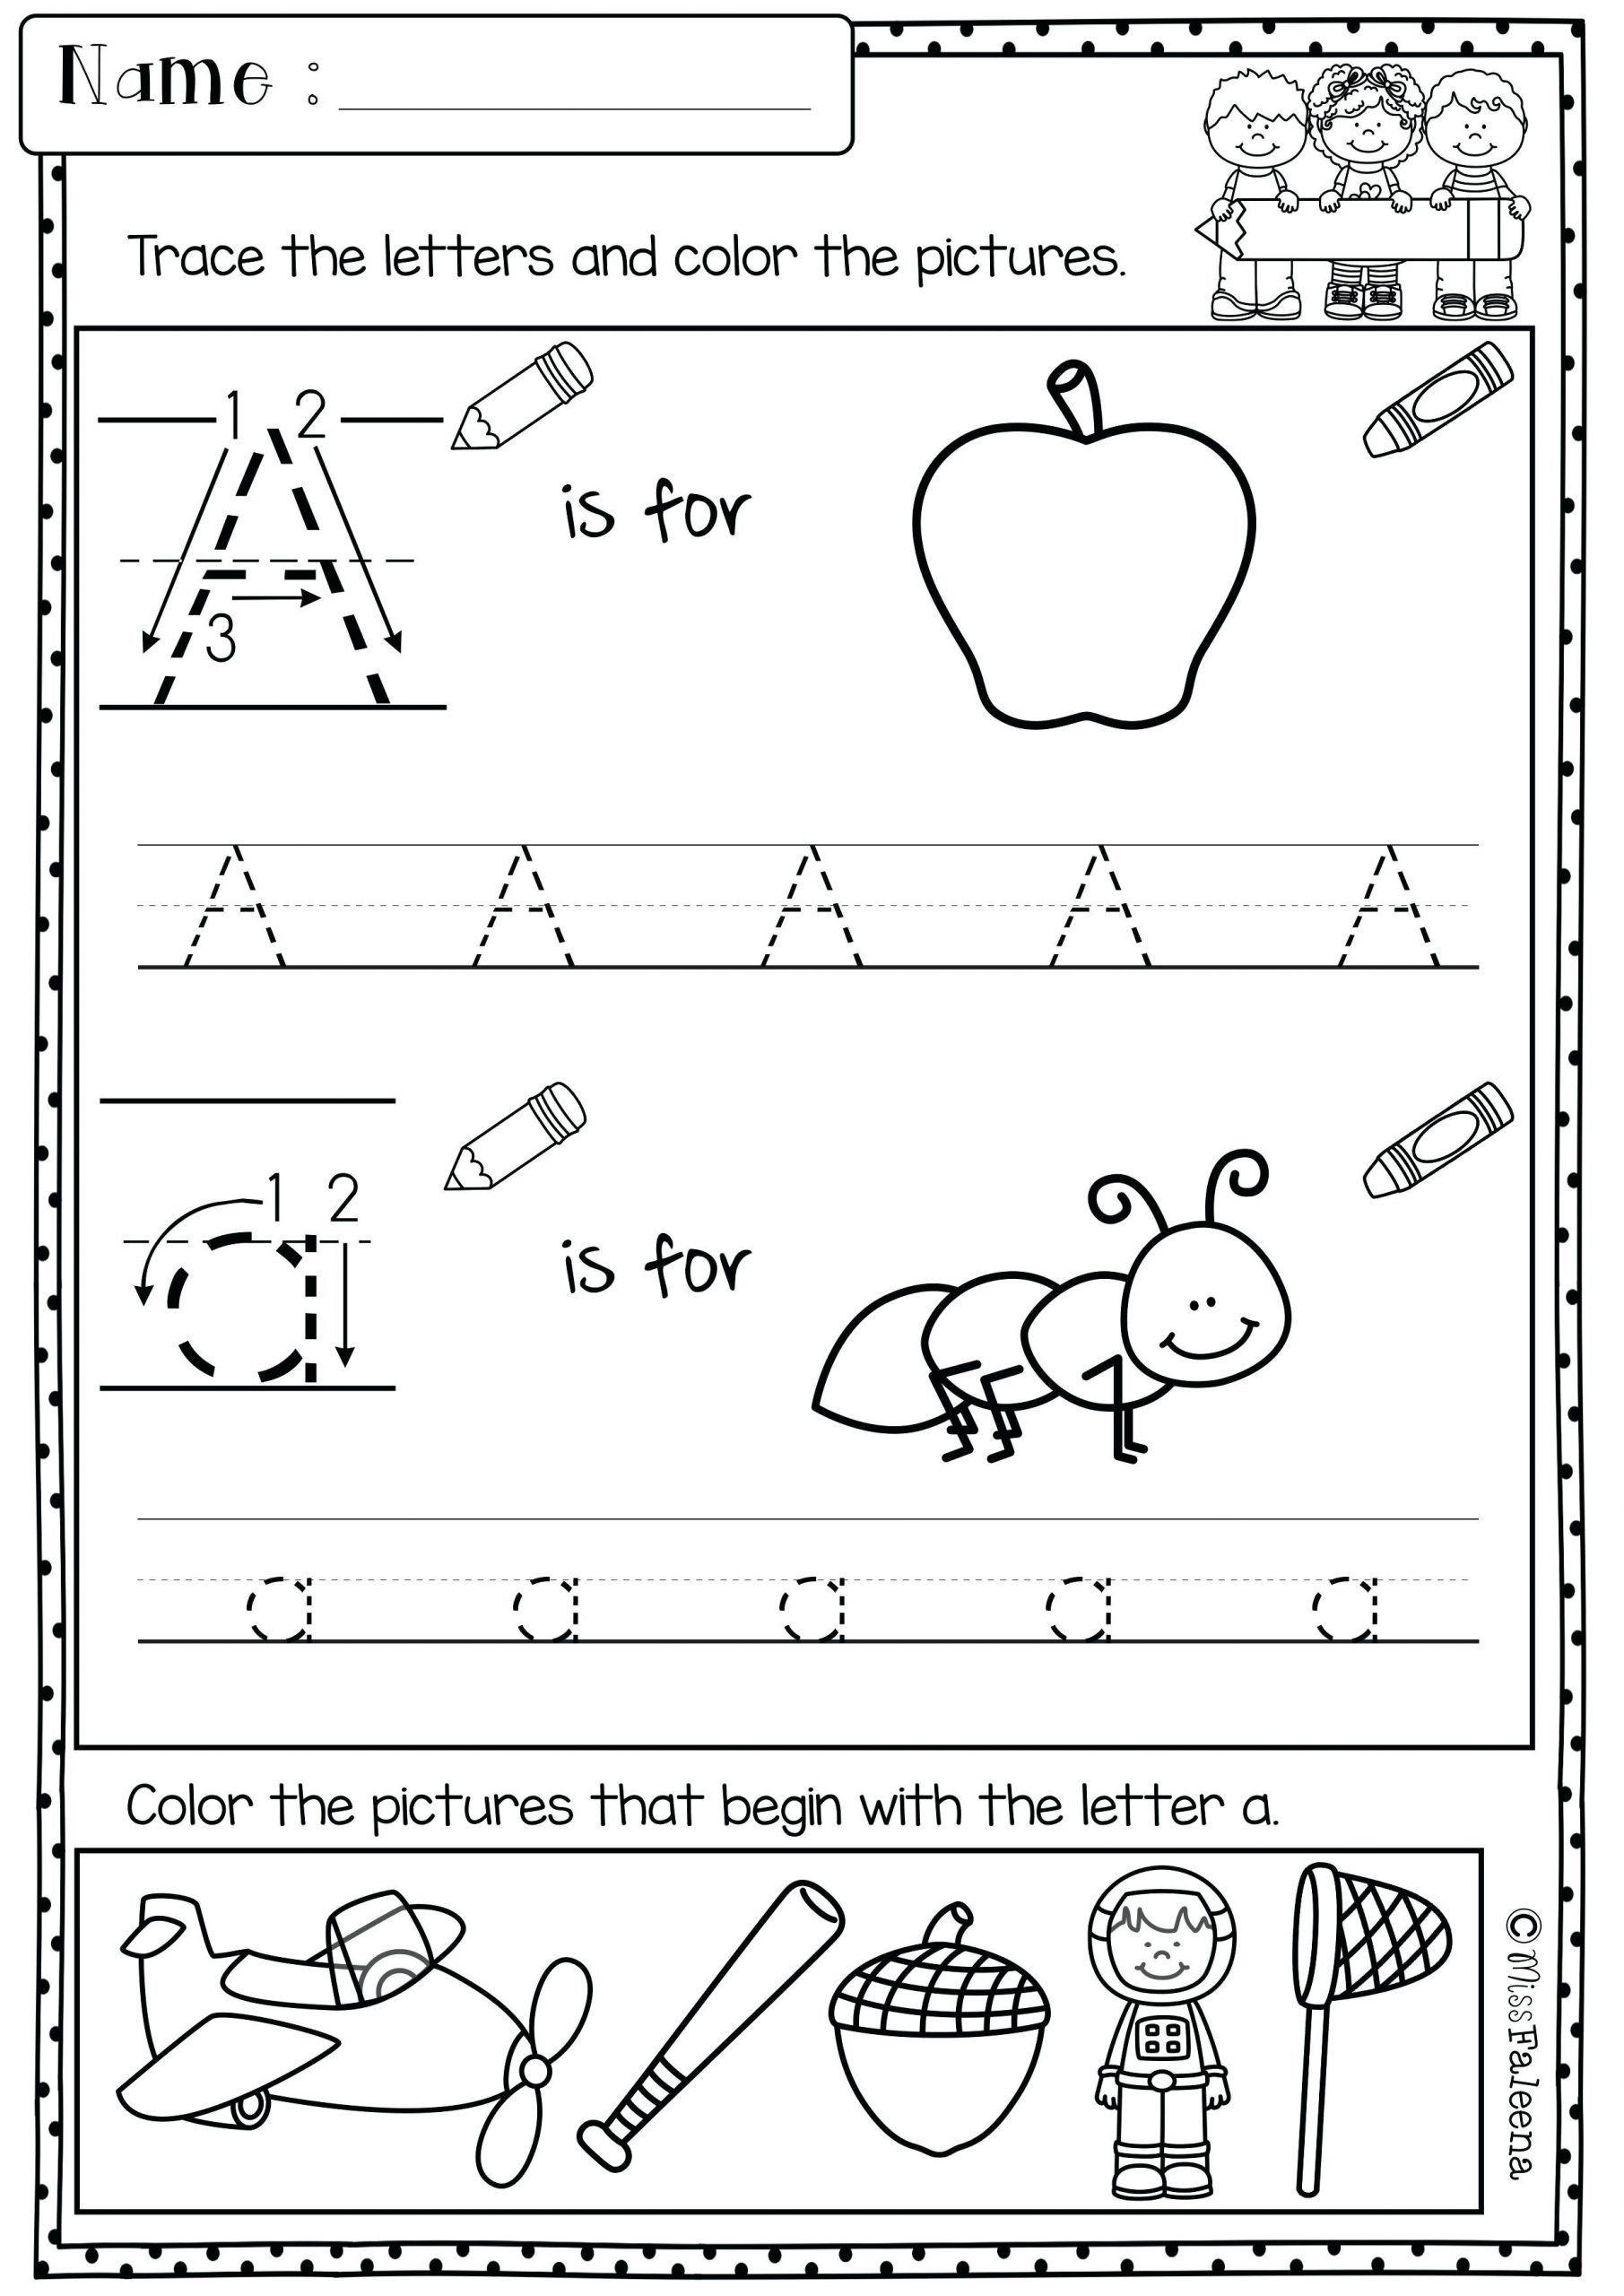 Morning Worksheets For Kindergarten Worksheet For